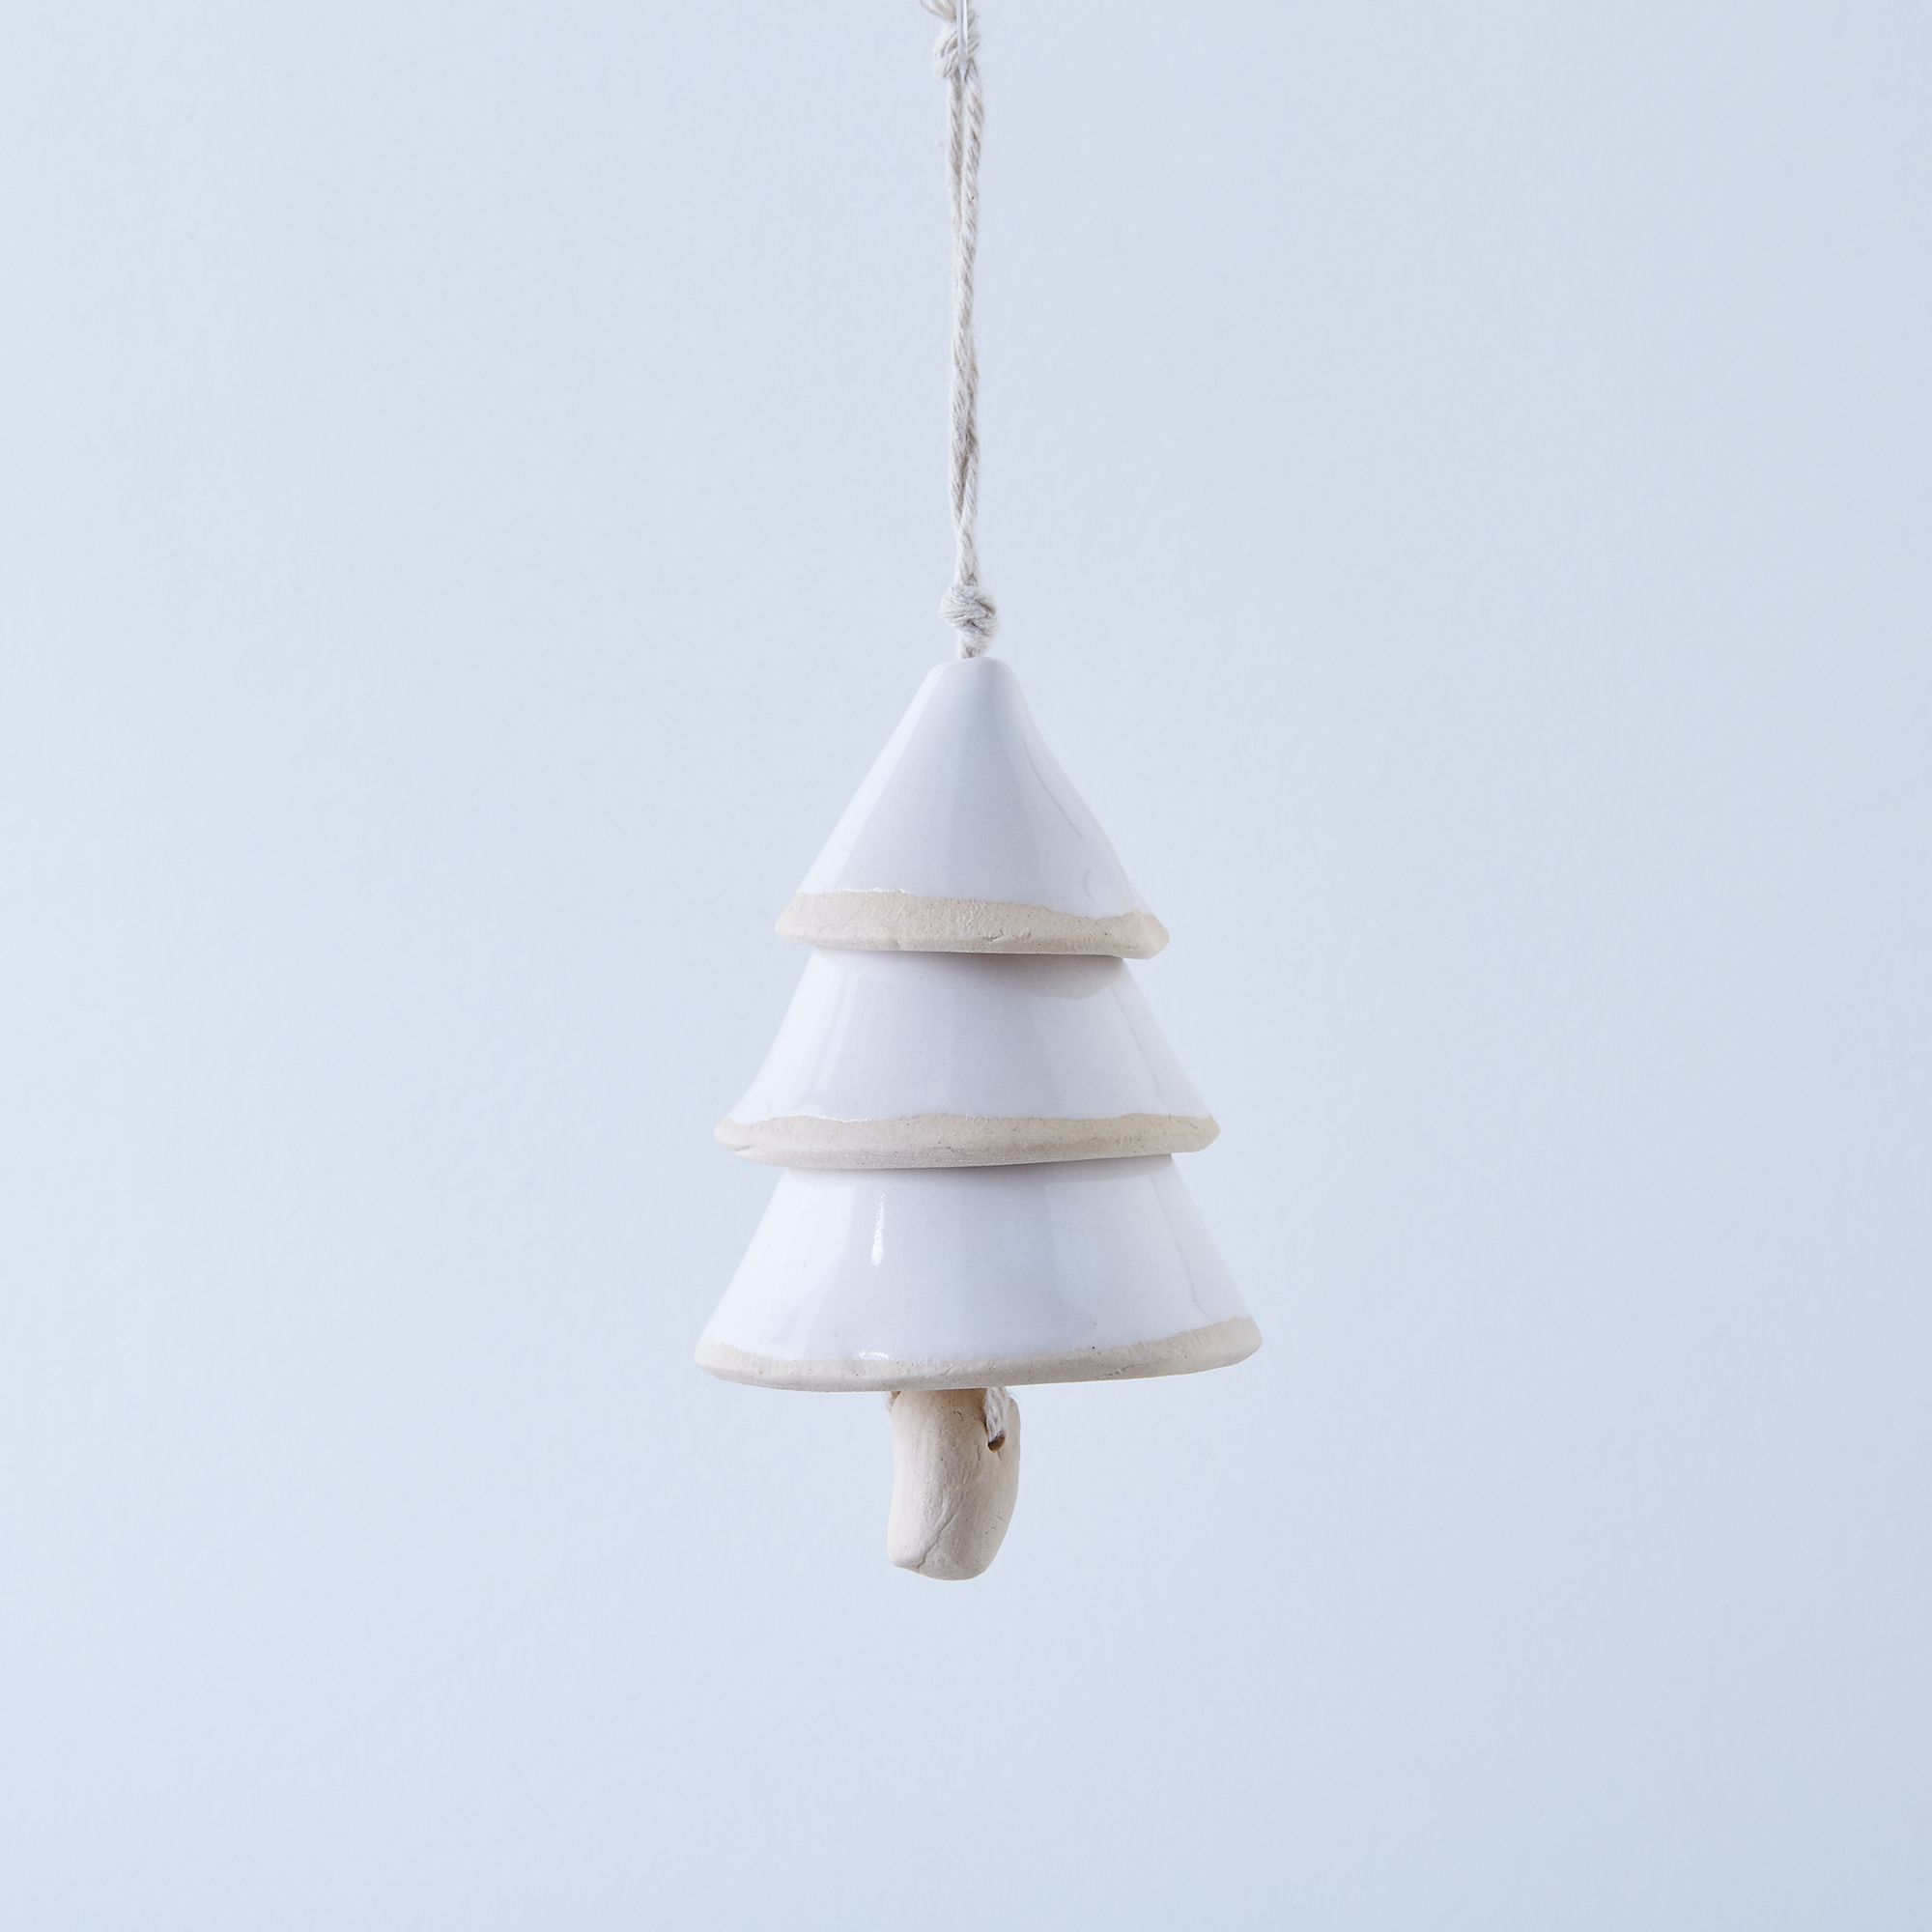 34d2f925 60aa 4c79 be8d ee7785f46227  2016 1004 handmade studio tn ceramic tree bell ornament white silo rocky luten 0628